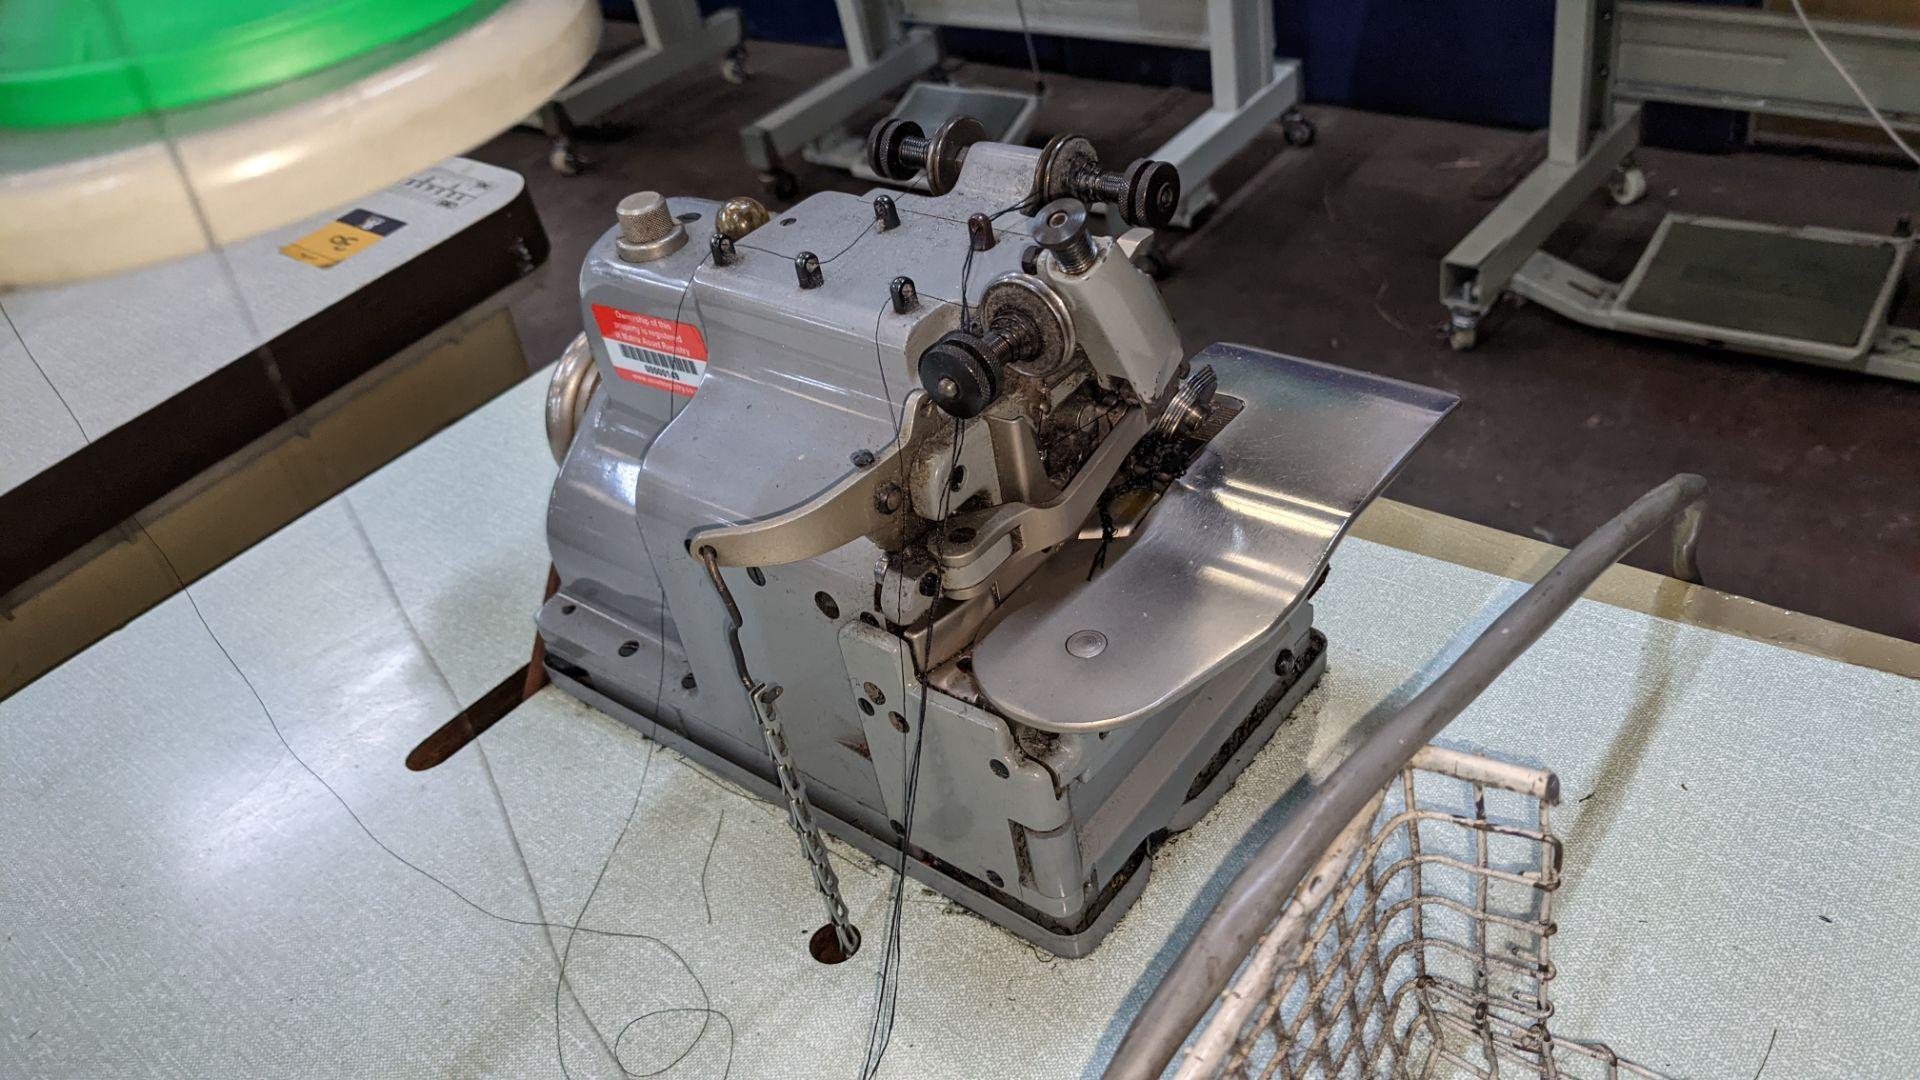 Merrow sewing machine, model M-30 - Image 10 of 14